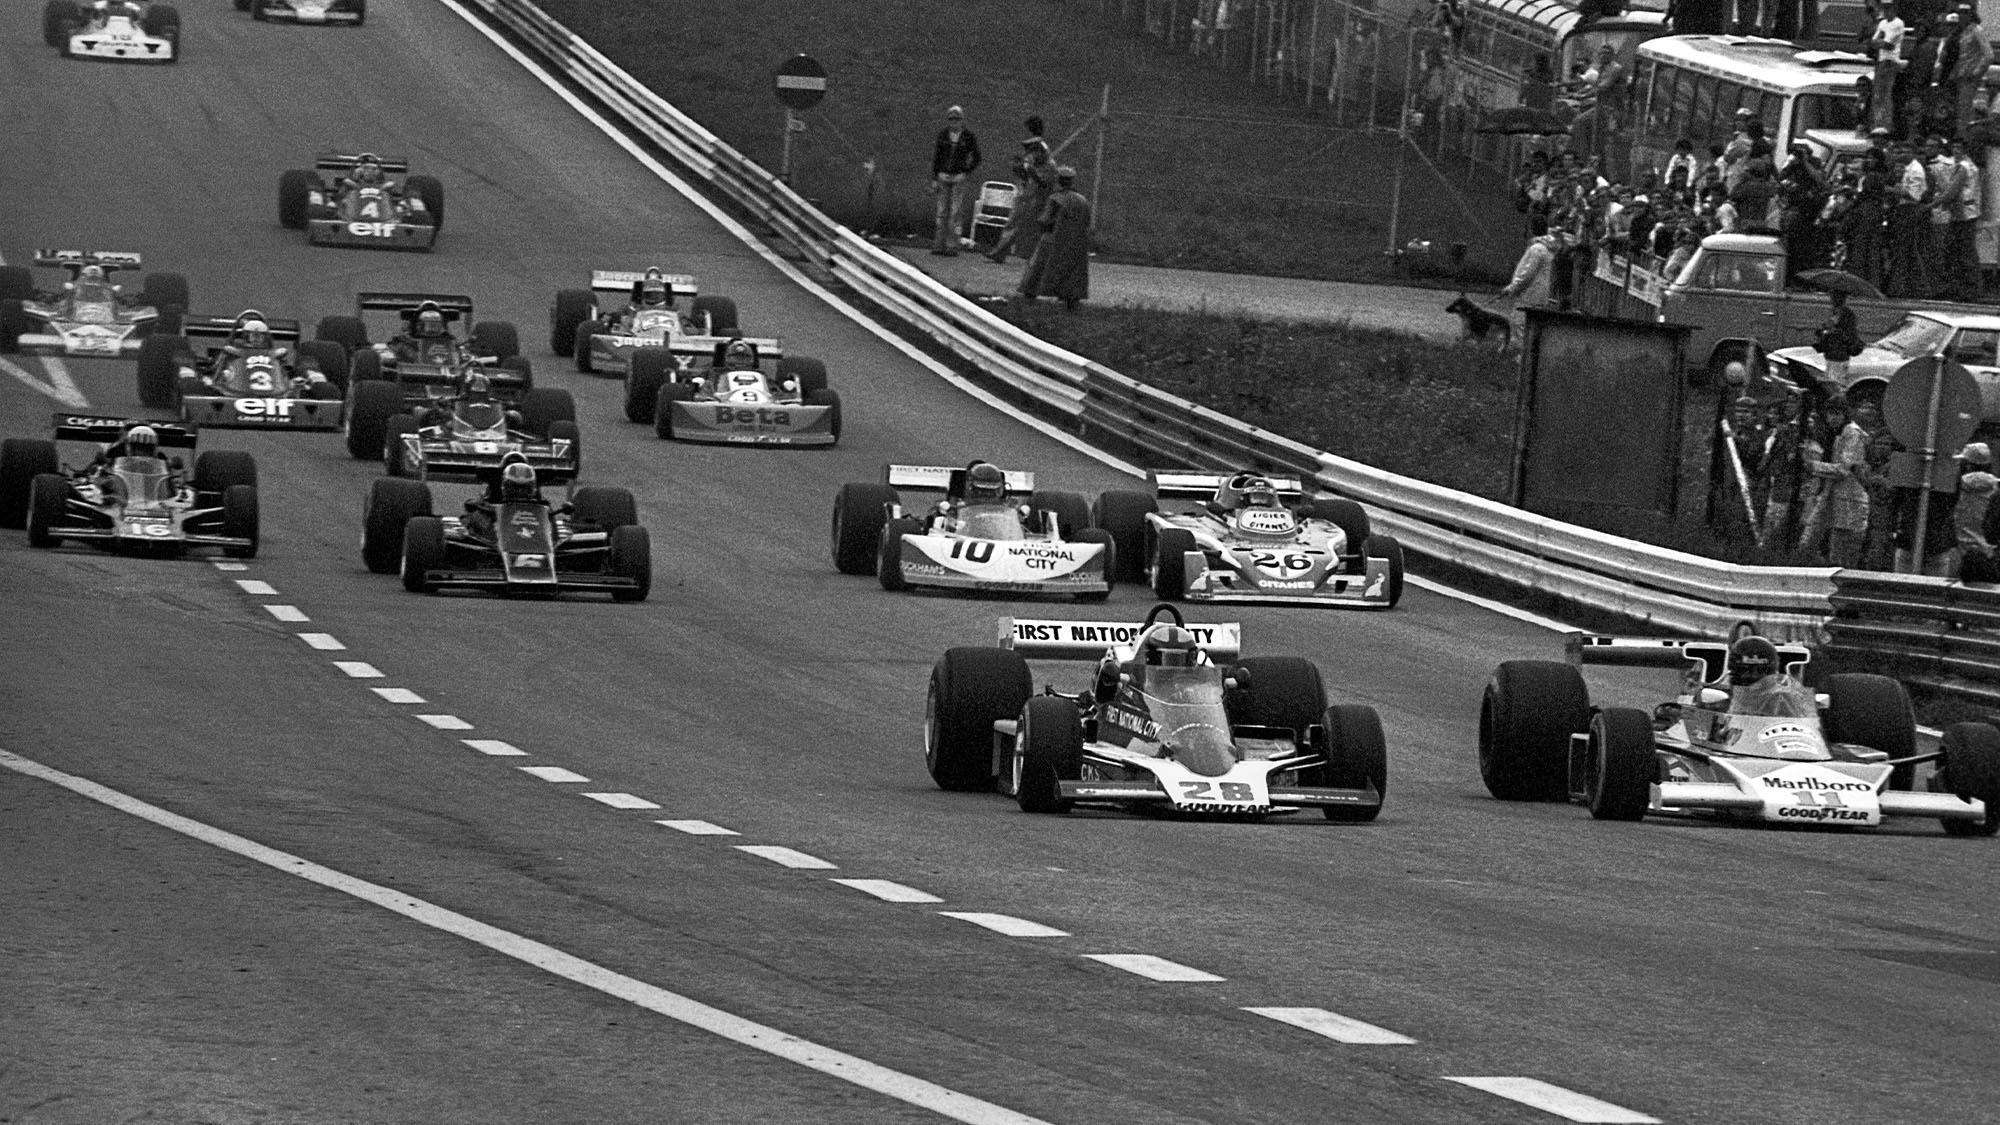 John Watson, James Hunt, Penske PC4, McLaren-Ford M23, Grand Prix of Austria, Zeltweg, 15 August 1976. (Photo by Bernard Cahier/Getty Images)